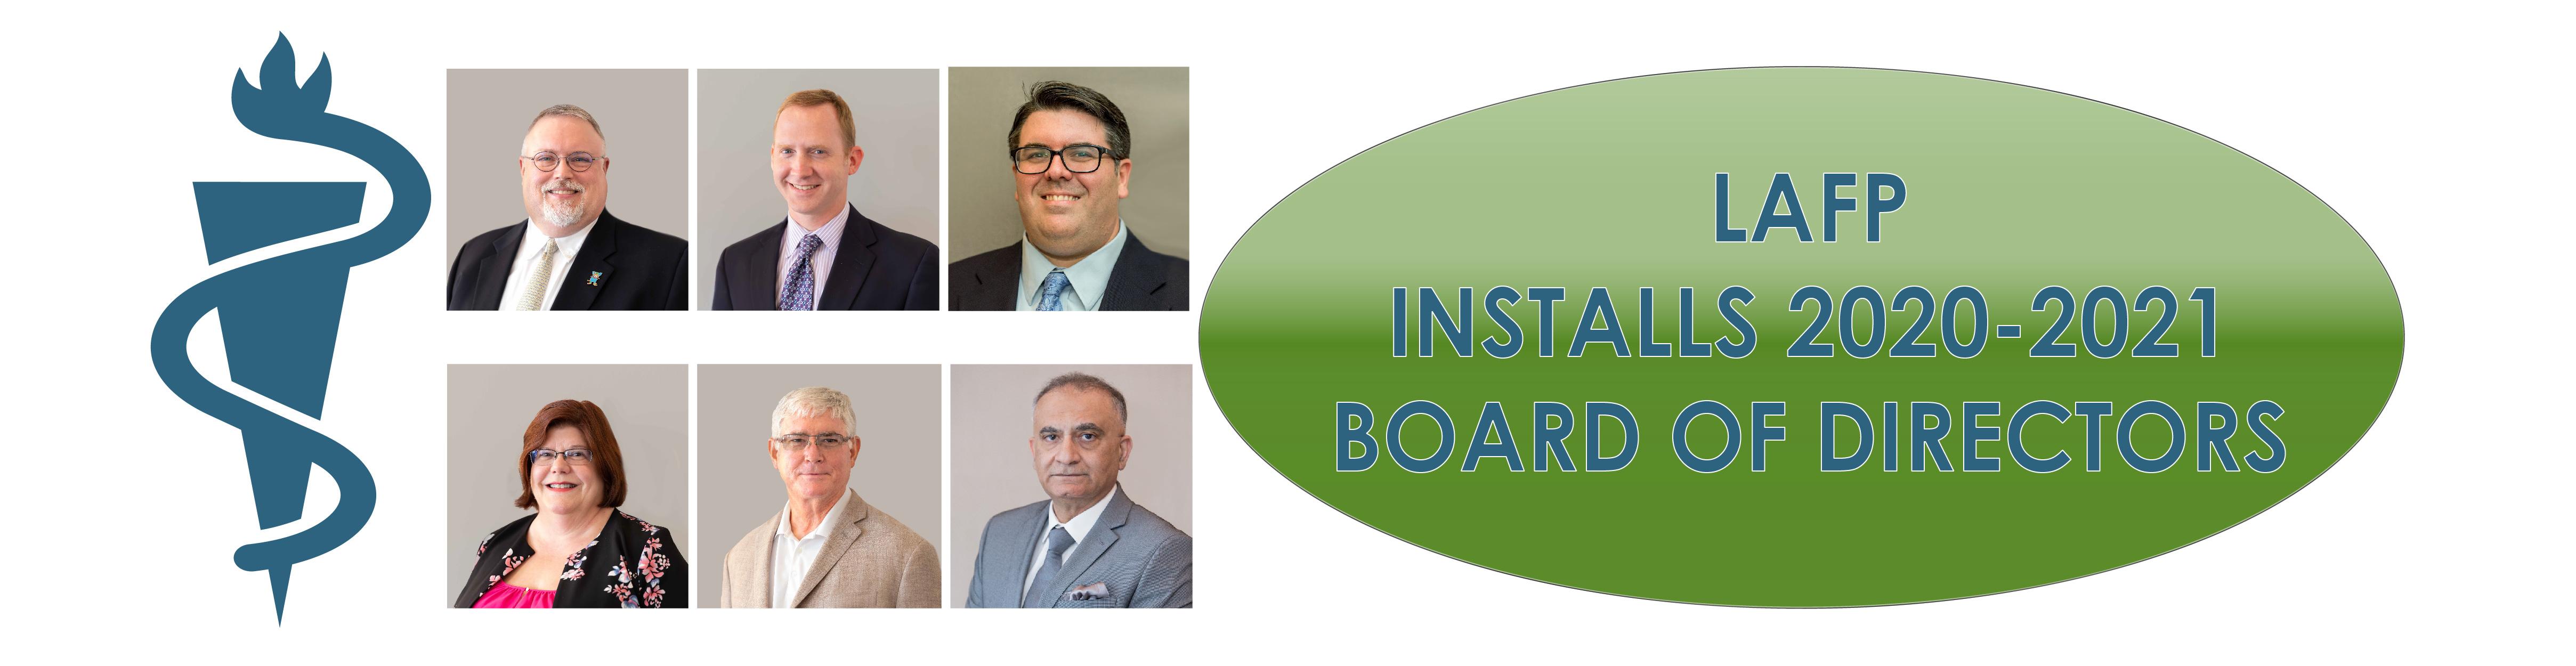 Board-Members20-01